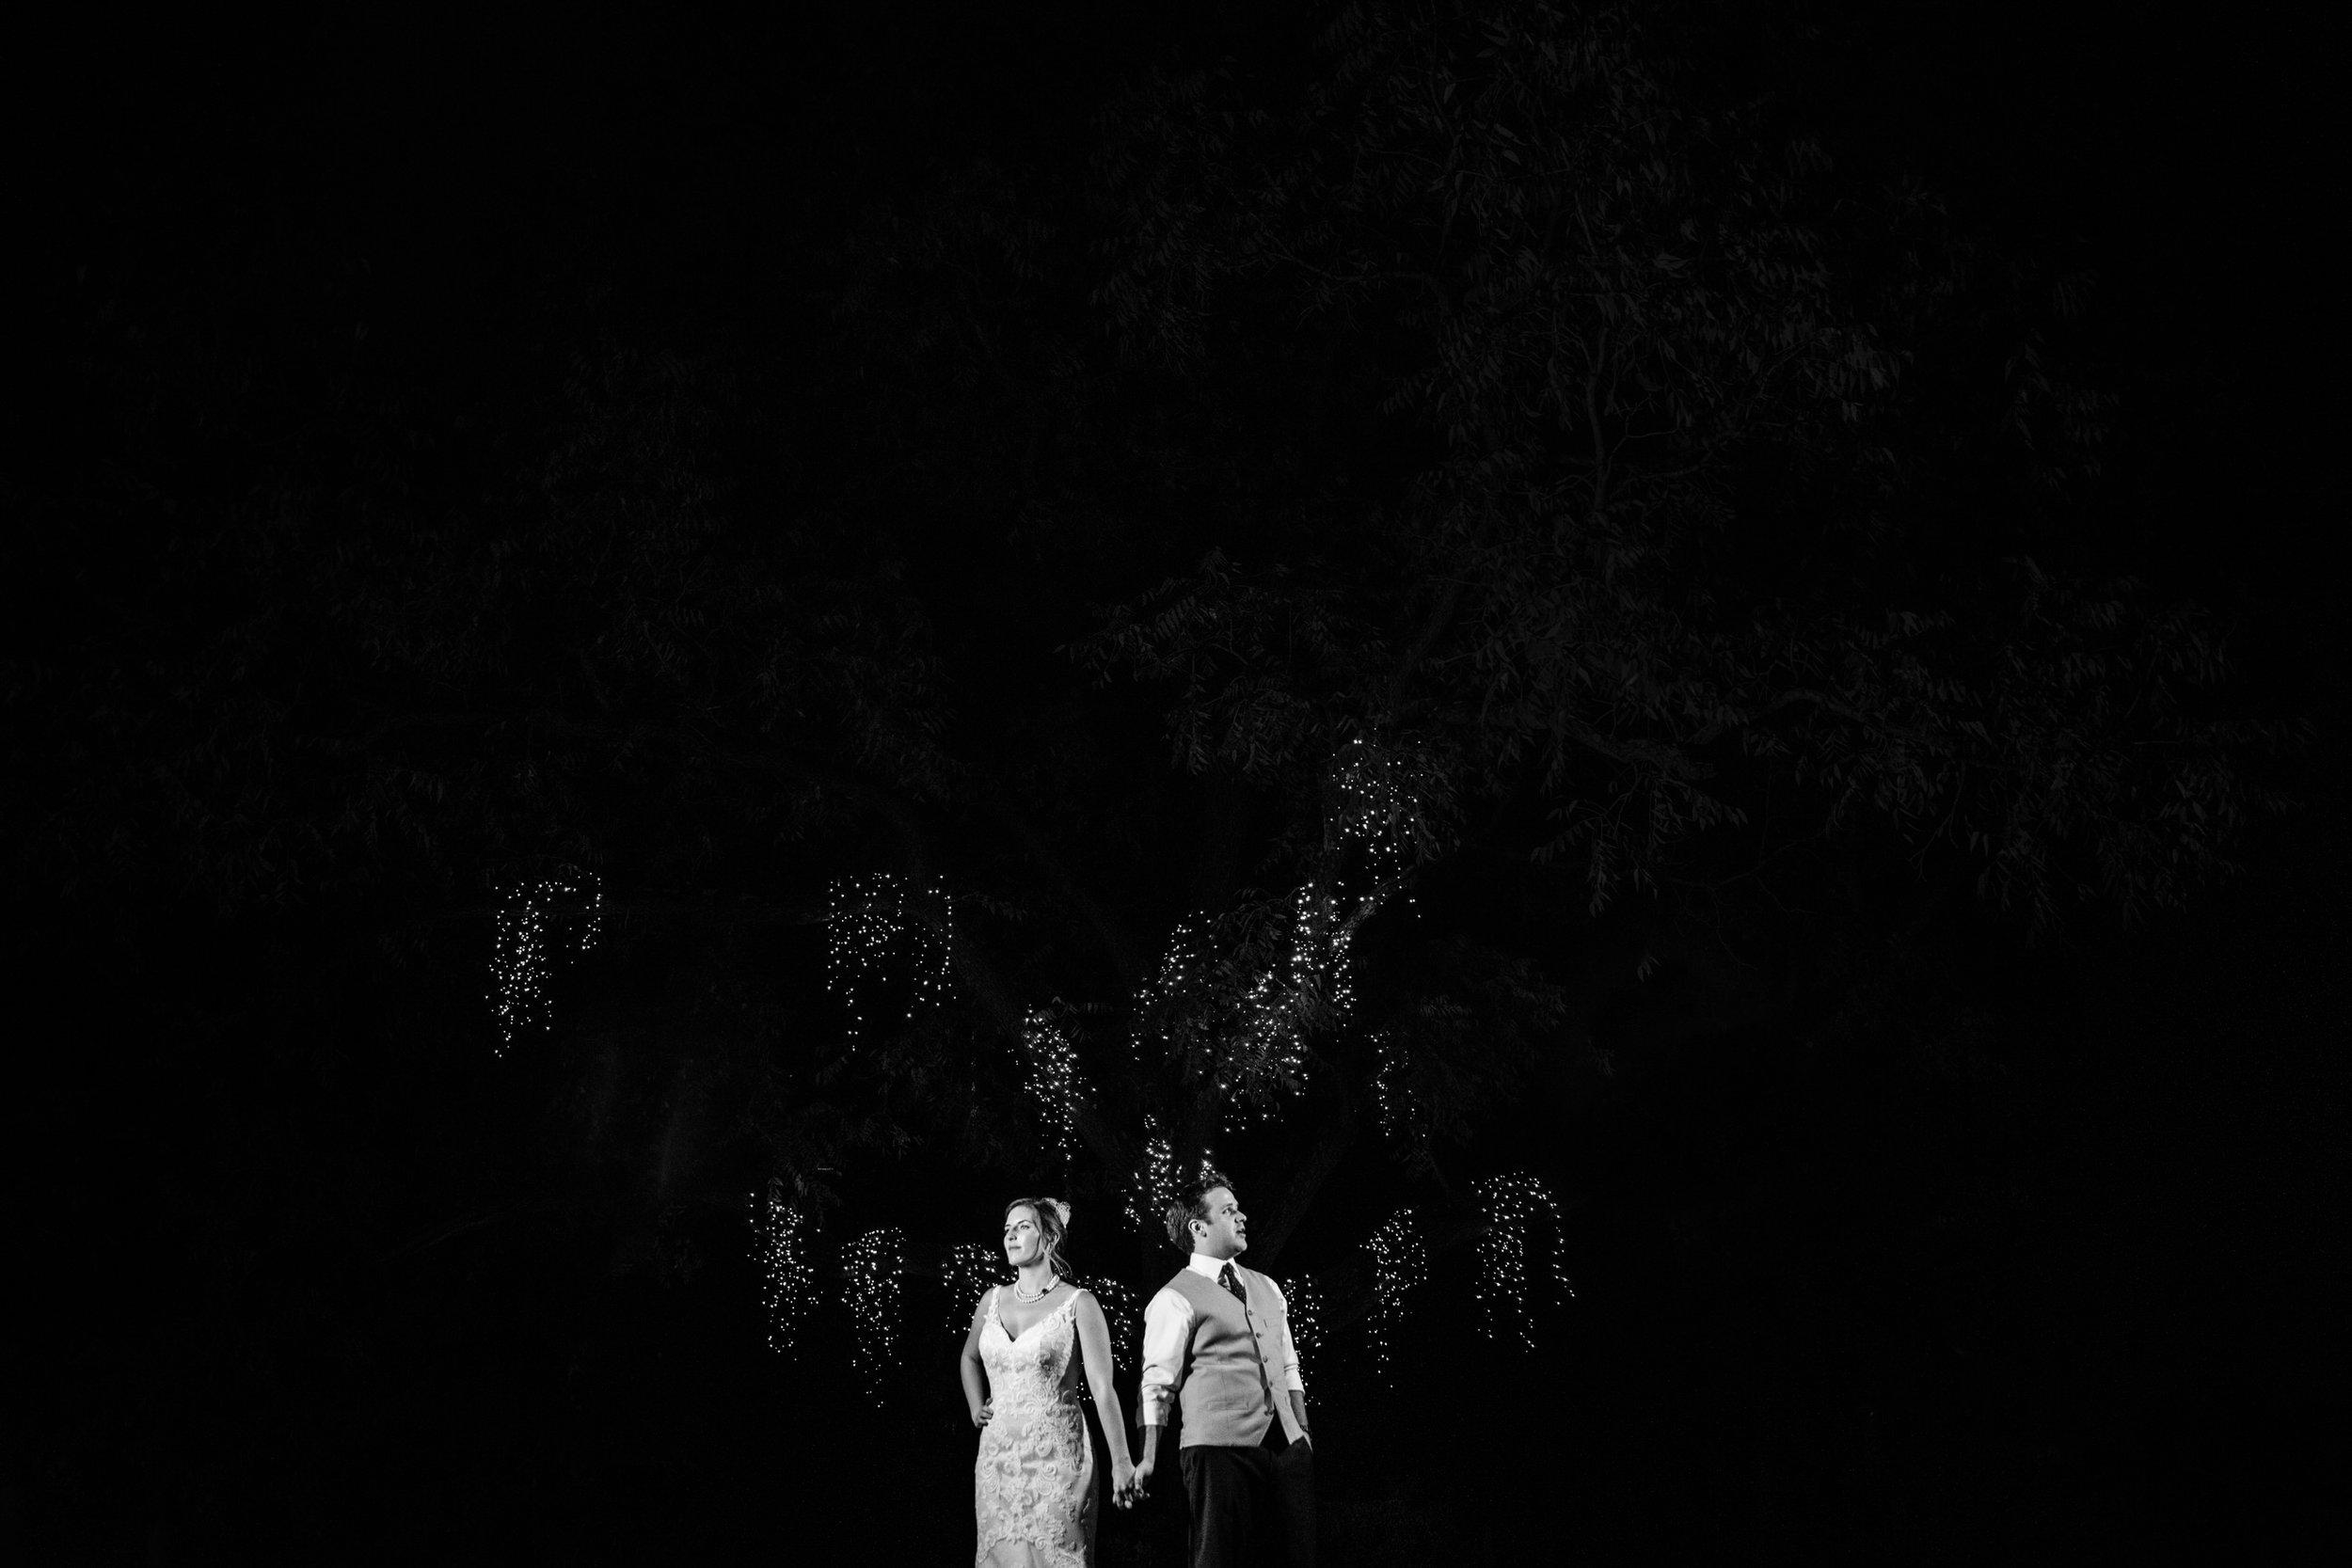 WalkersOverlookWedding-Angela&Ben-Reception-246a.jpg